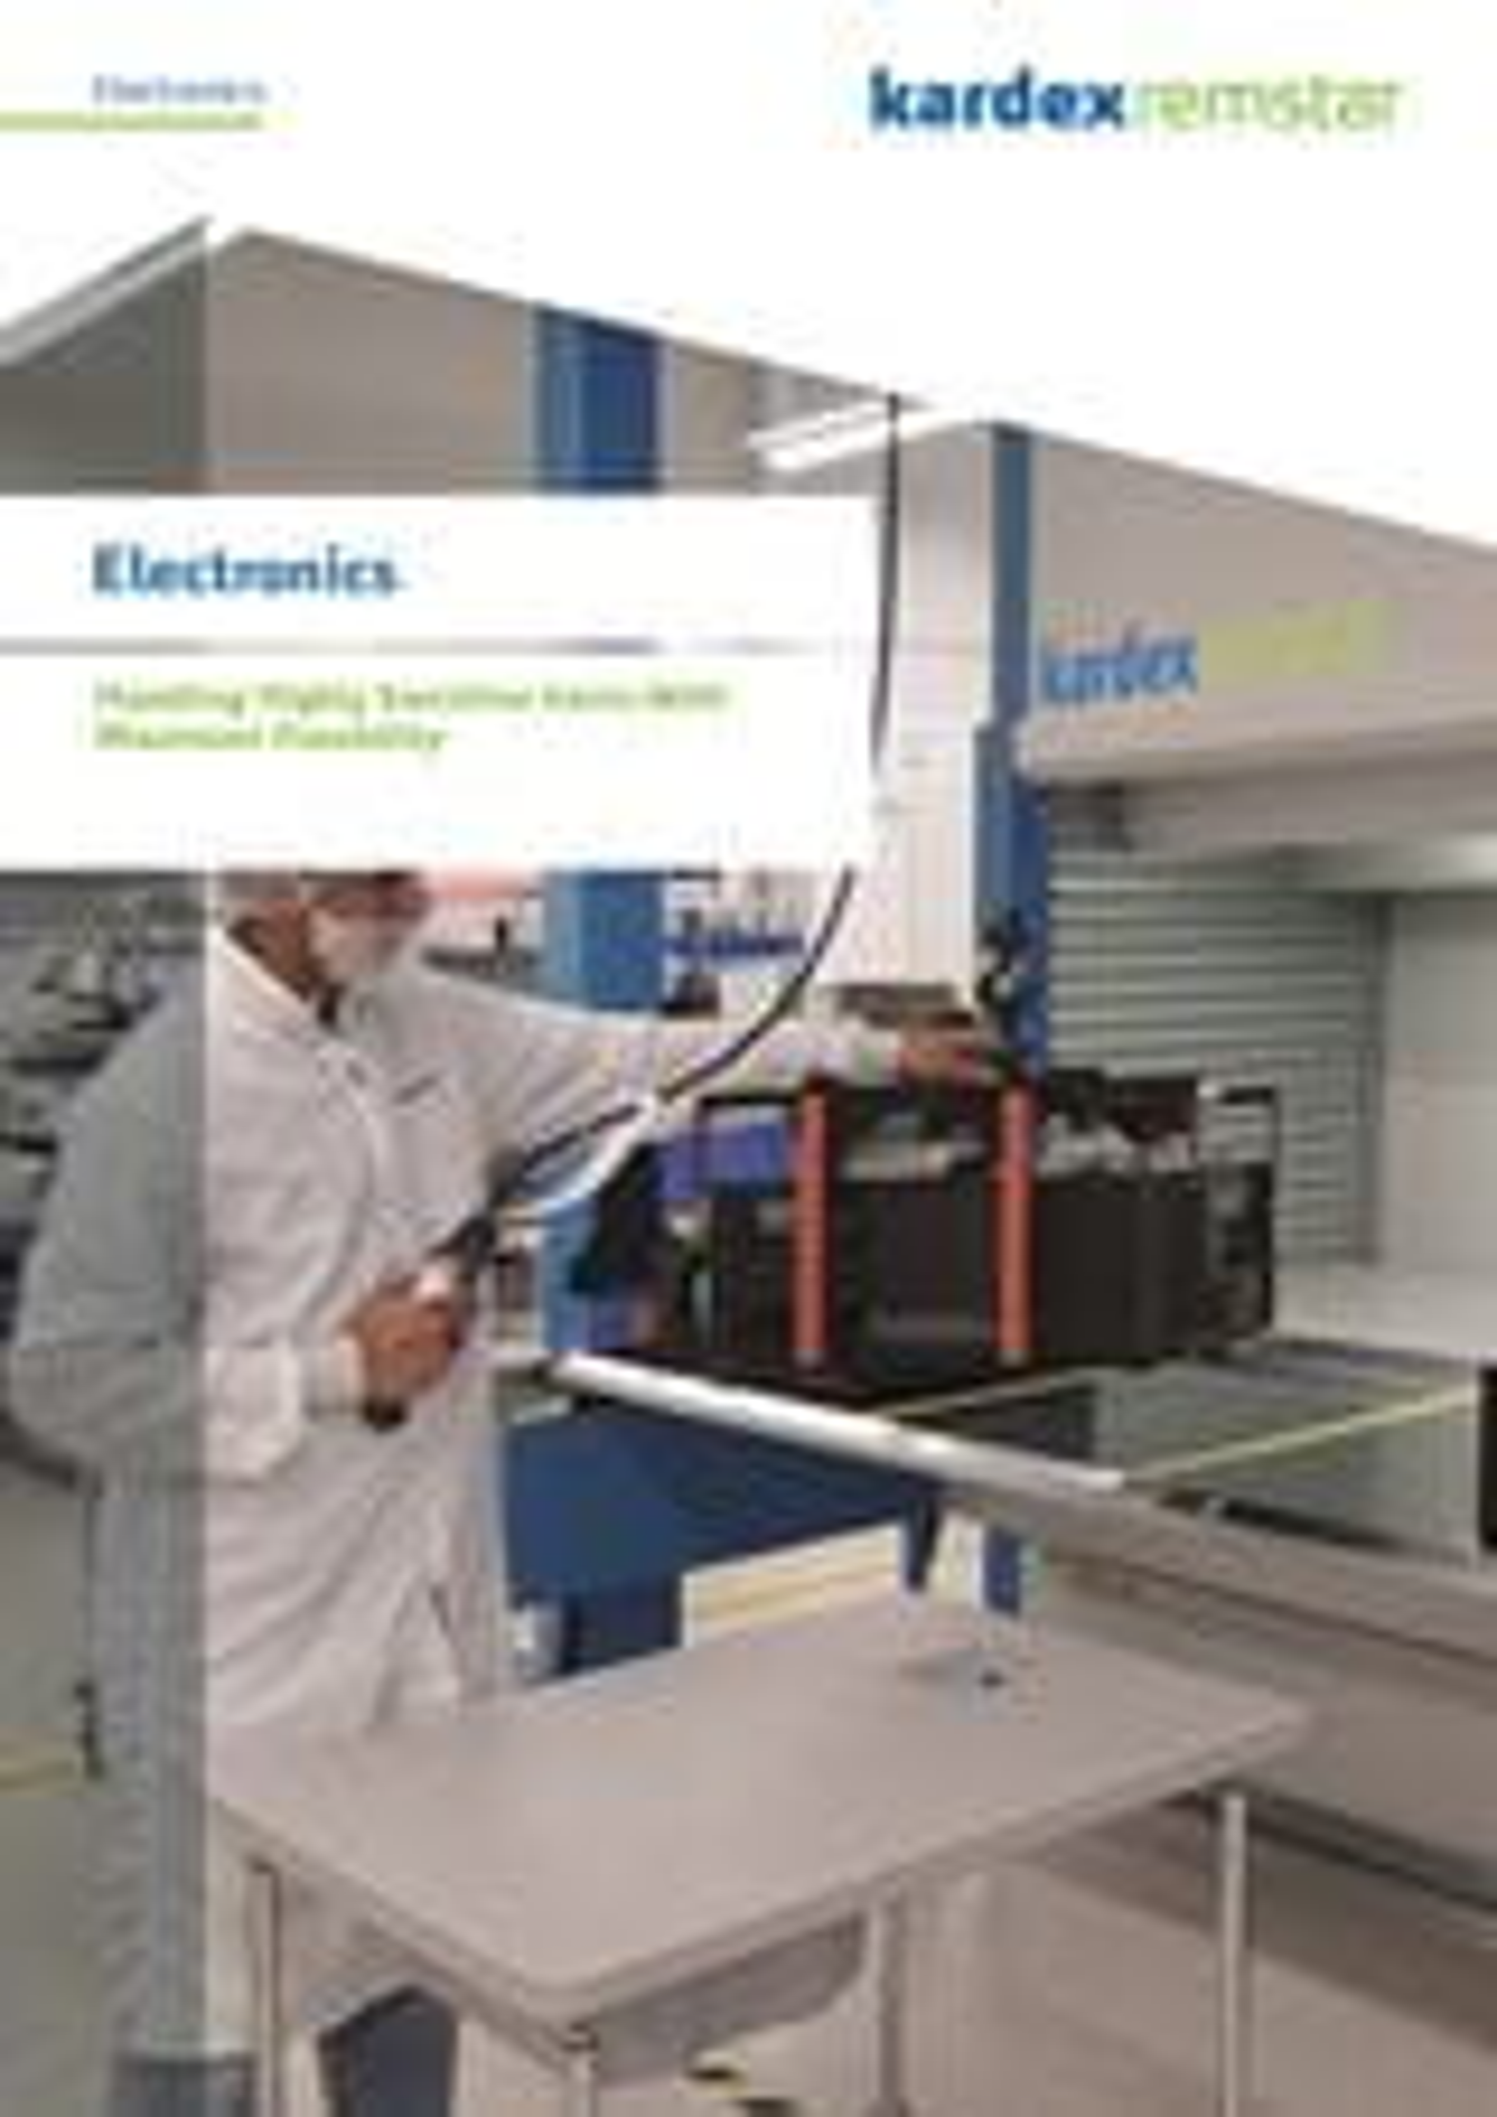 Electronics Brochure Kardex Remstar